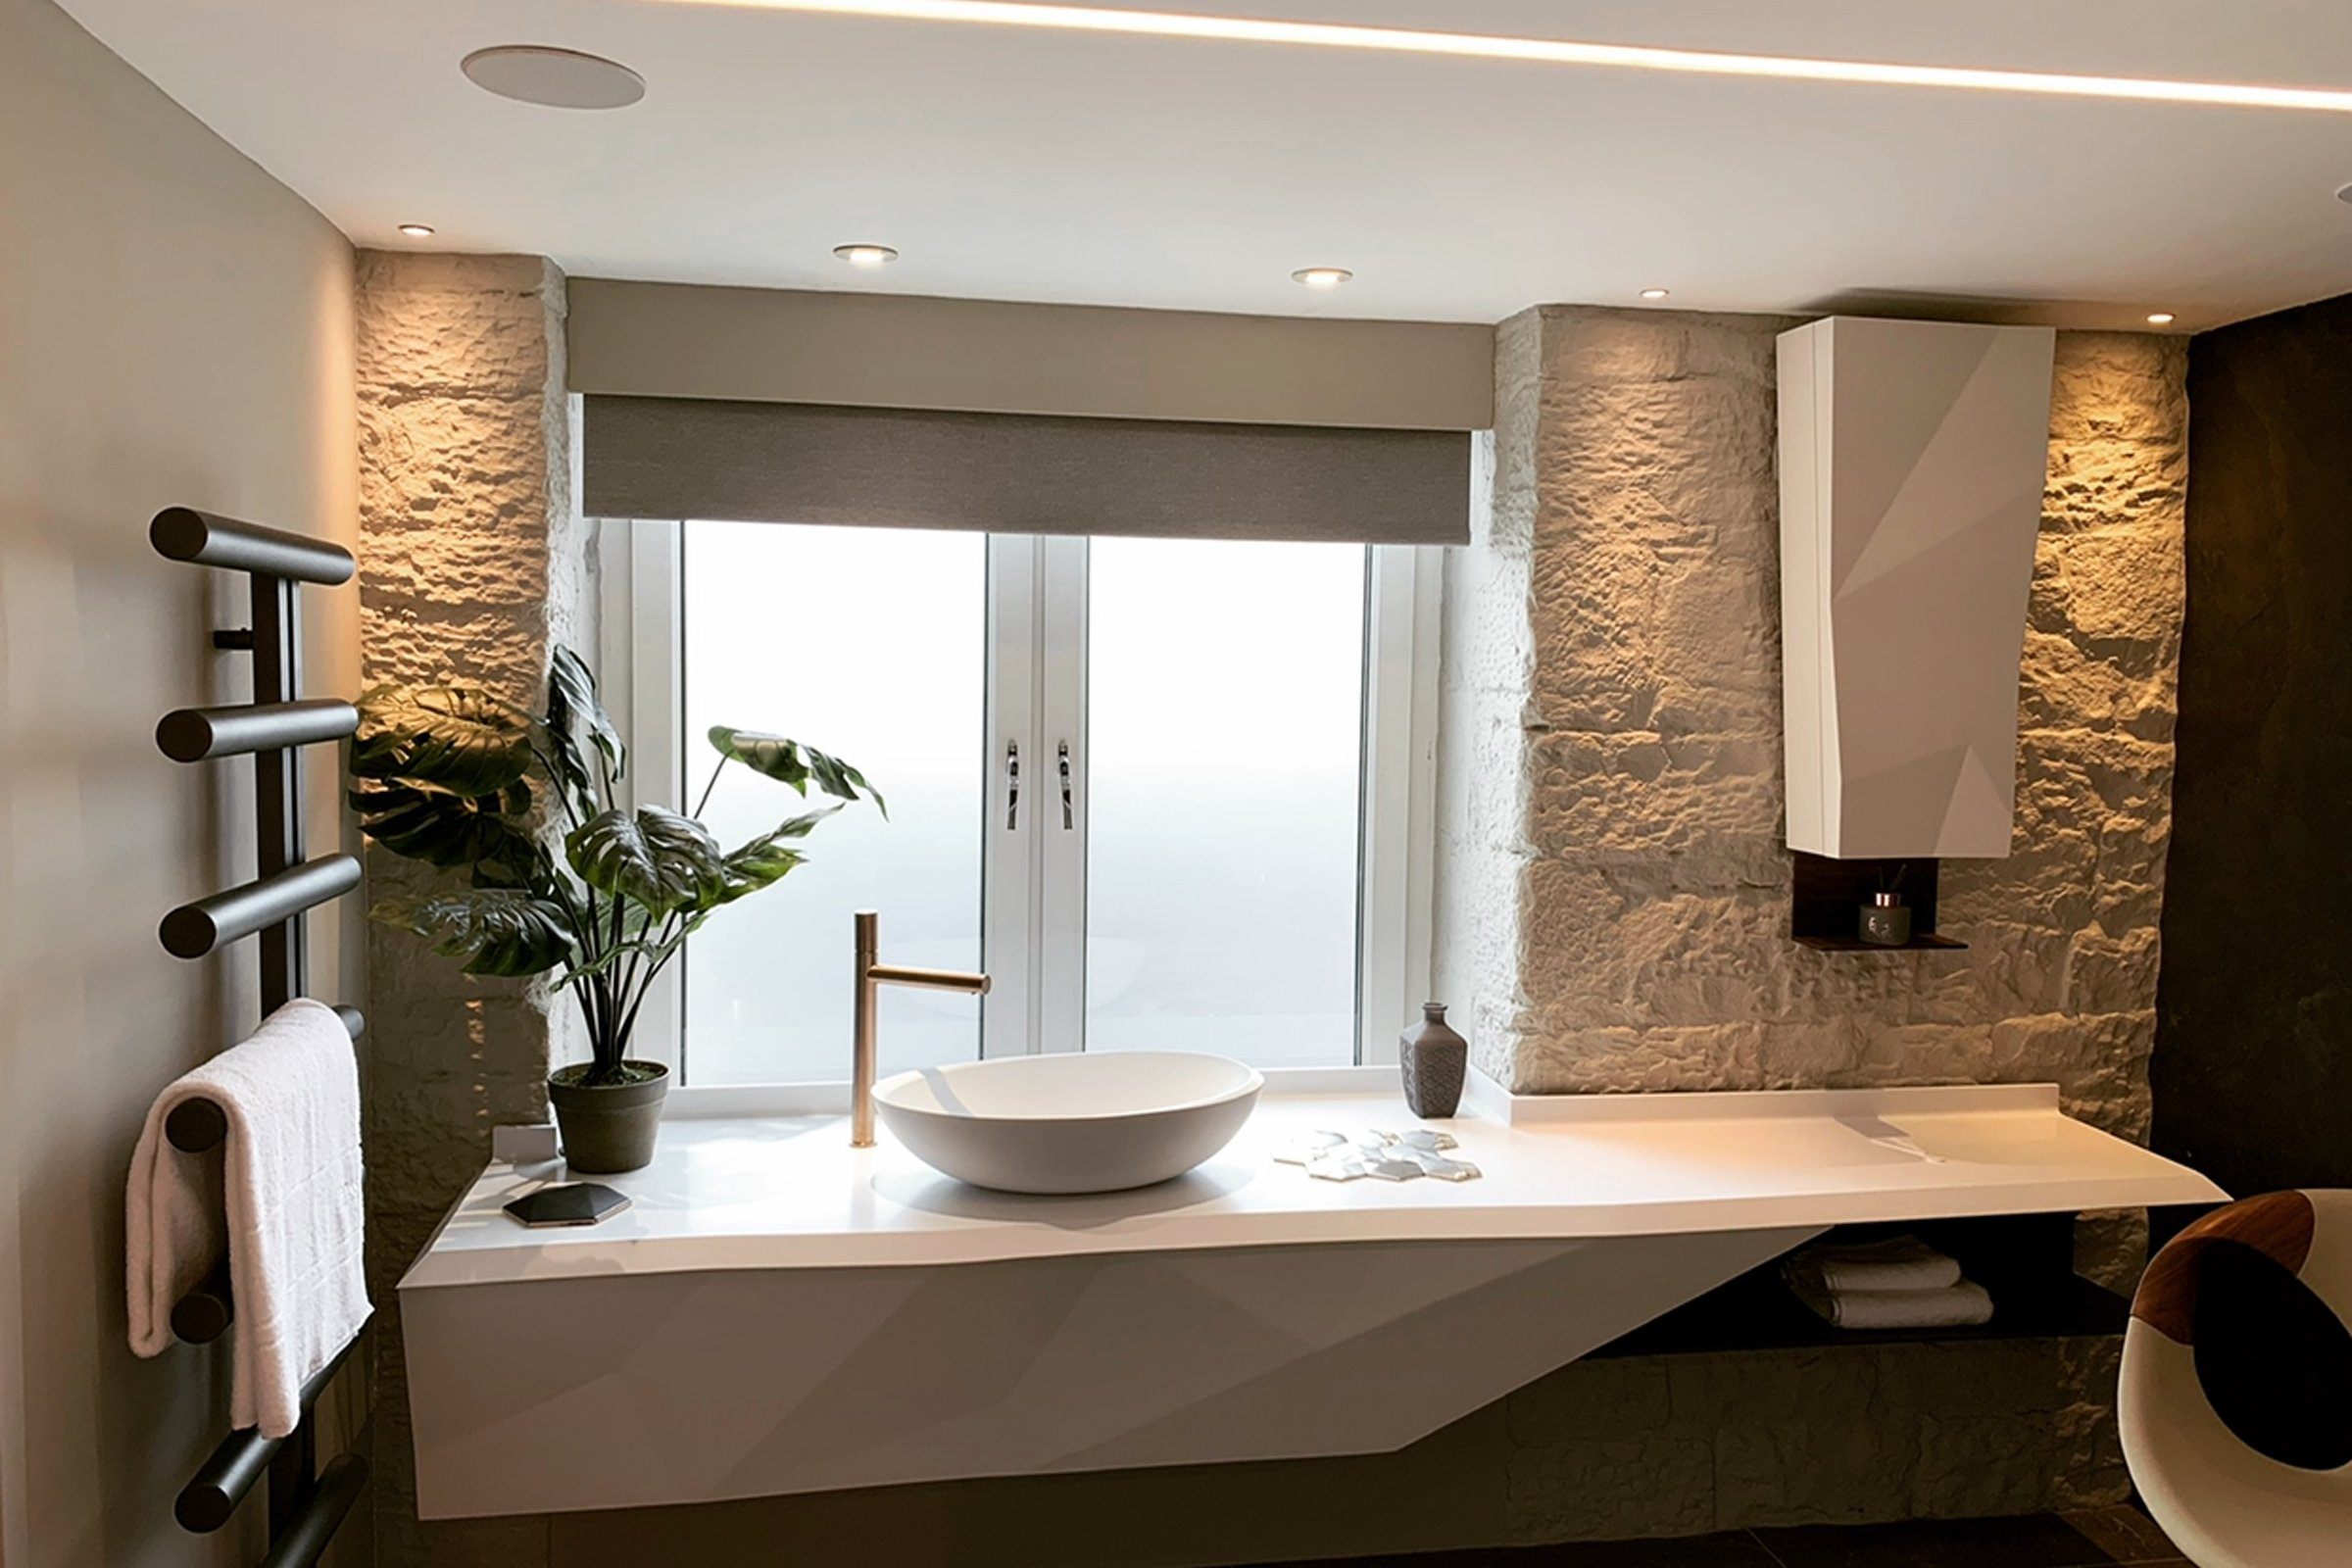 Designer bathroom featuring Rako lighting control and Sonance in-ceiling speakers